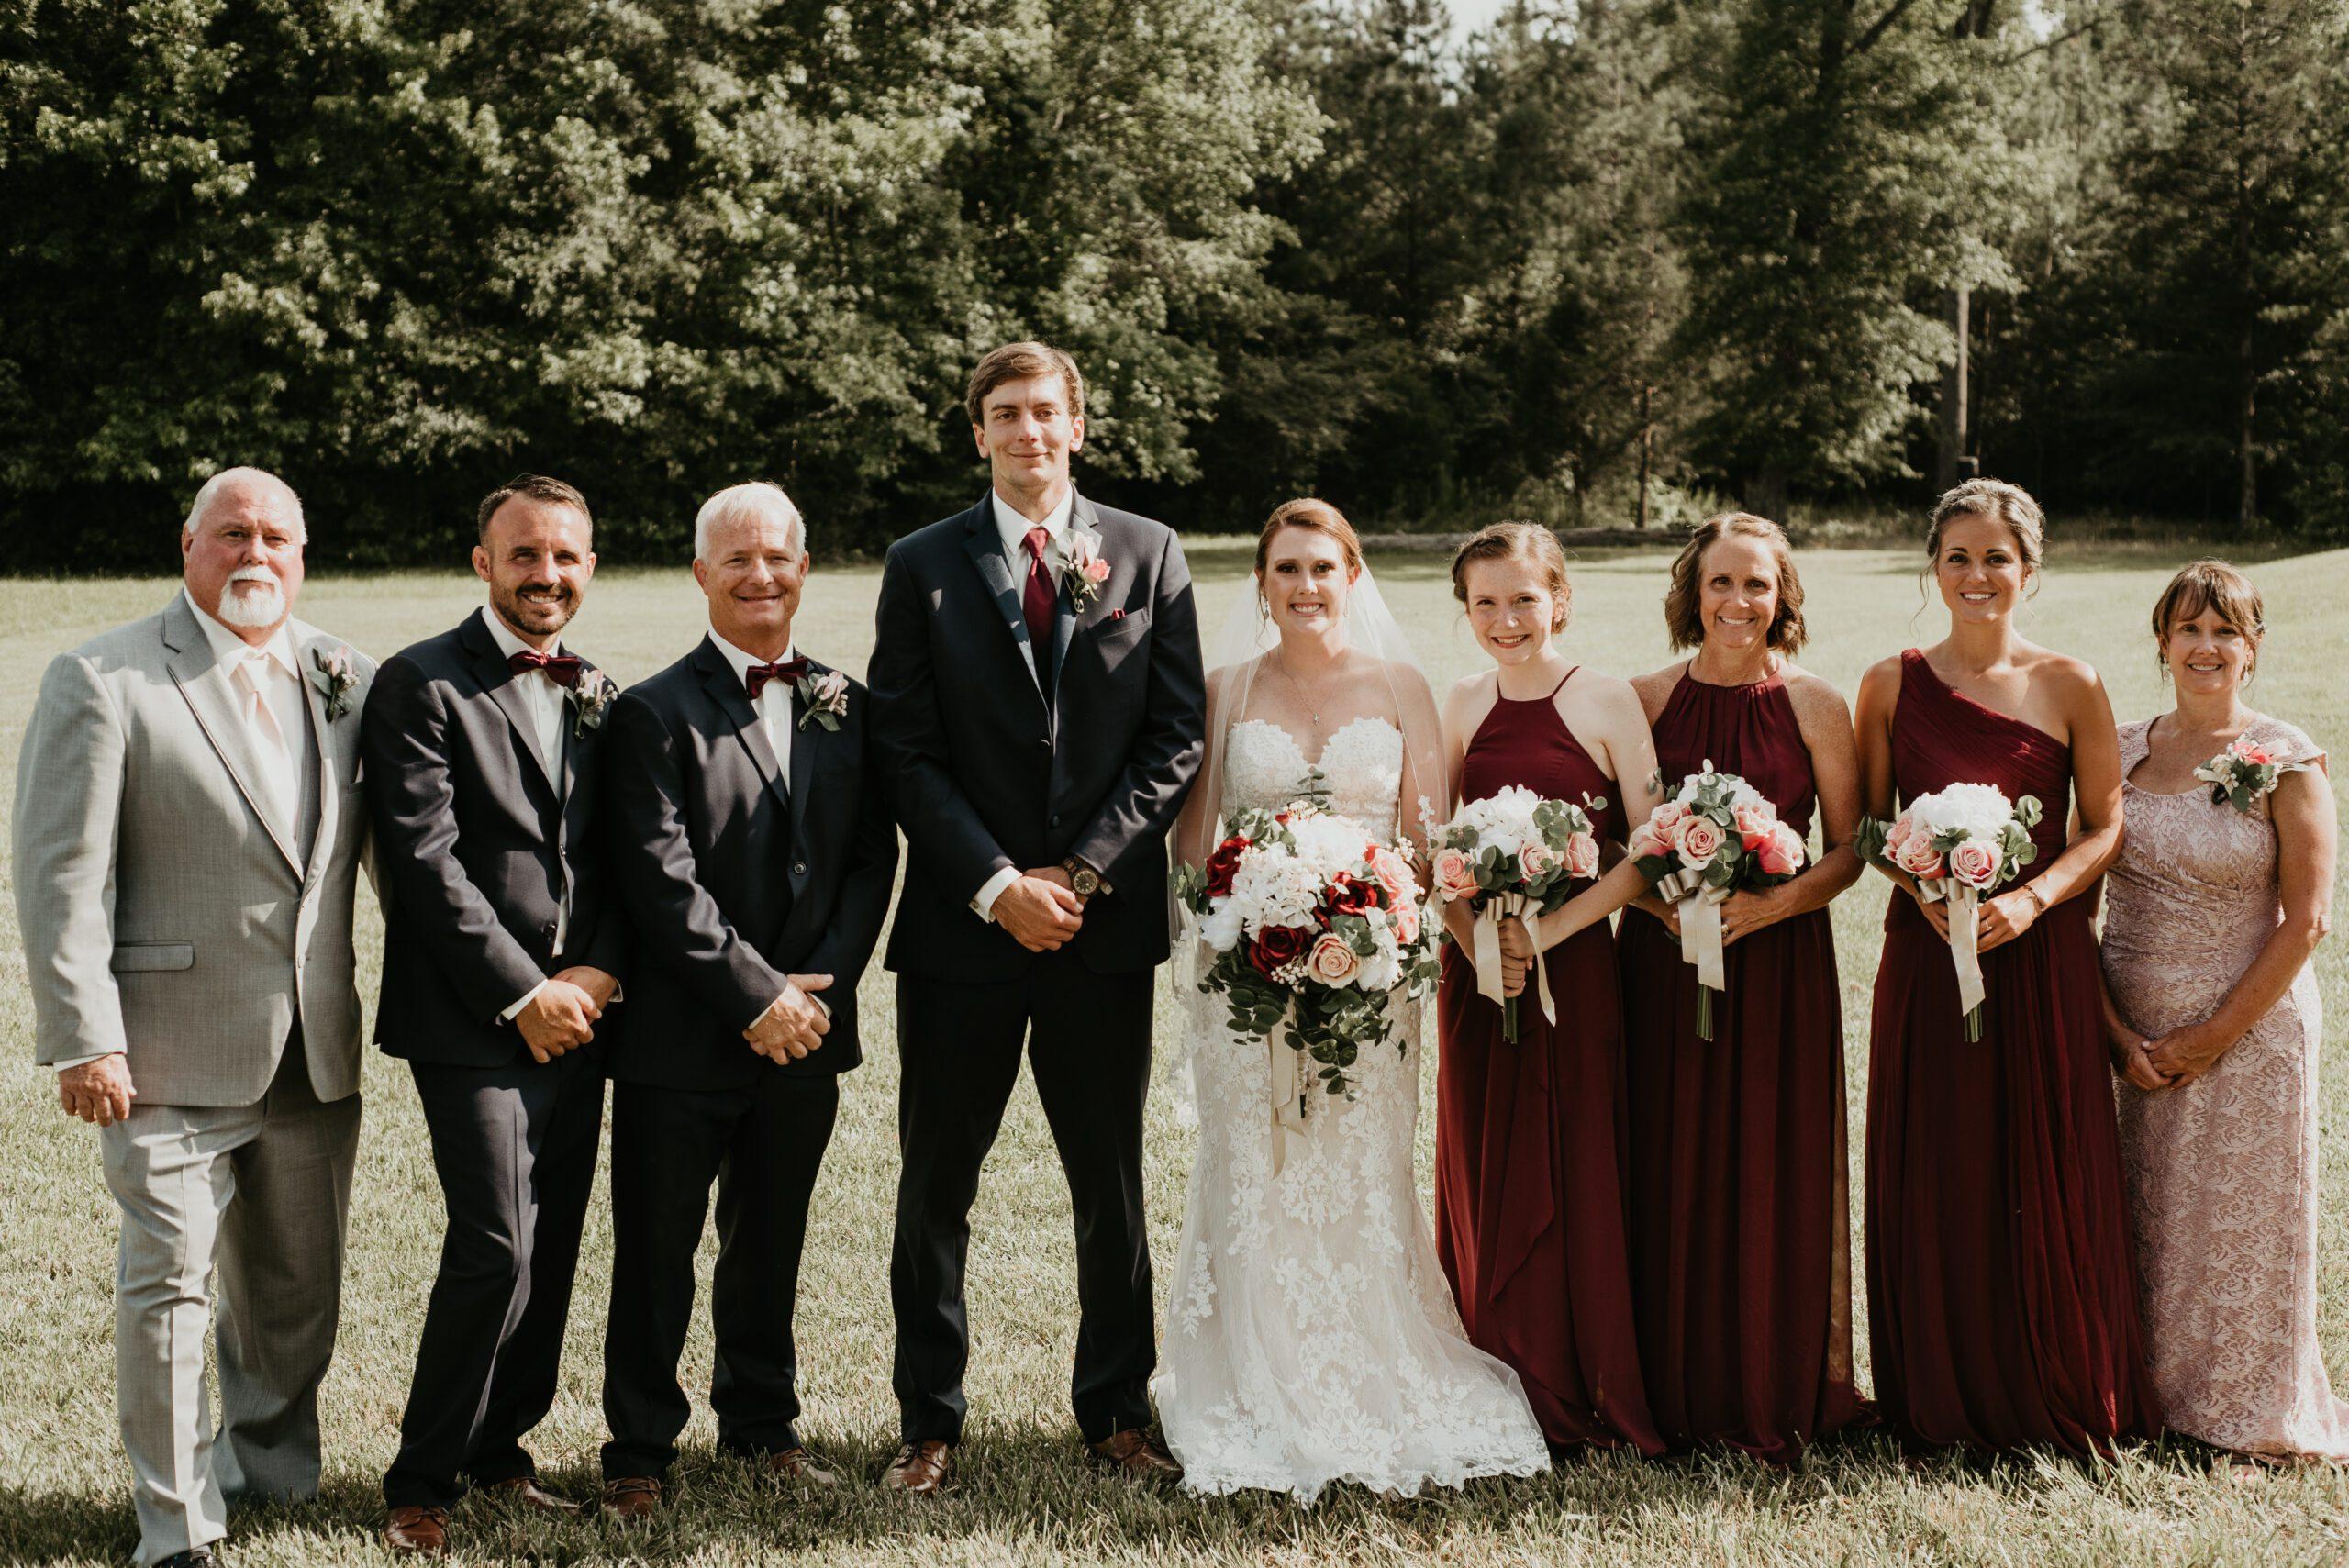 Wedding Saved by Pediatric Dentists